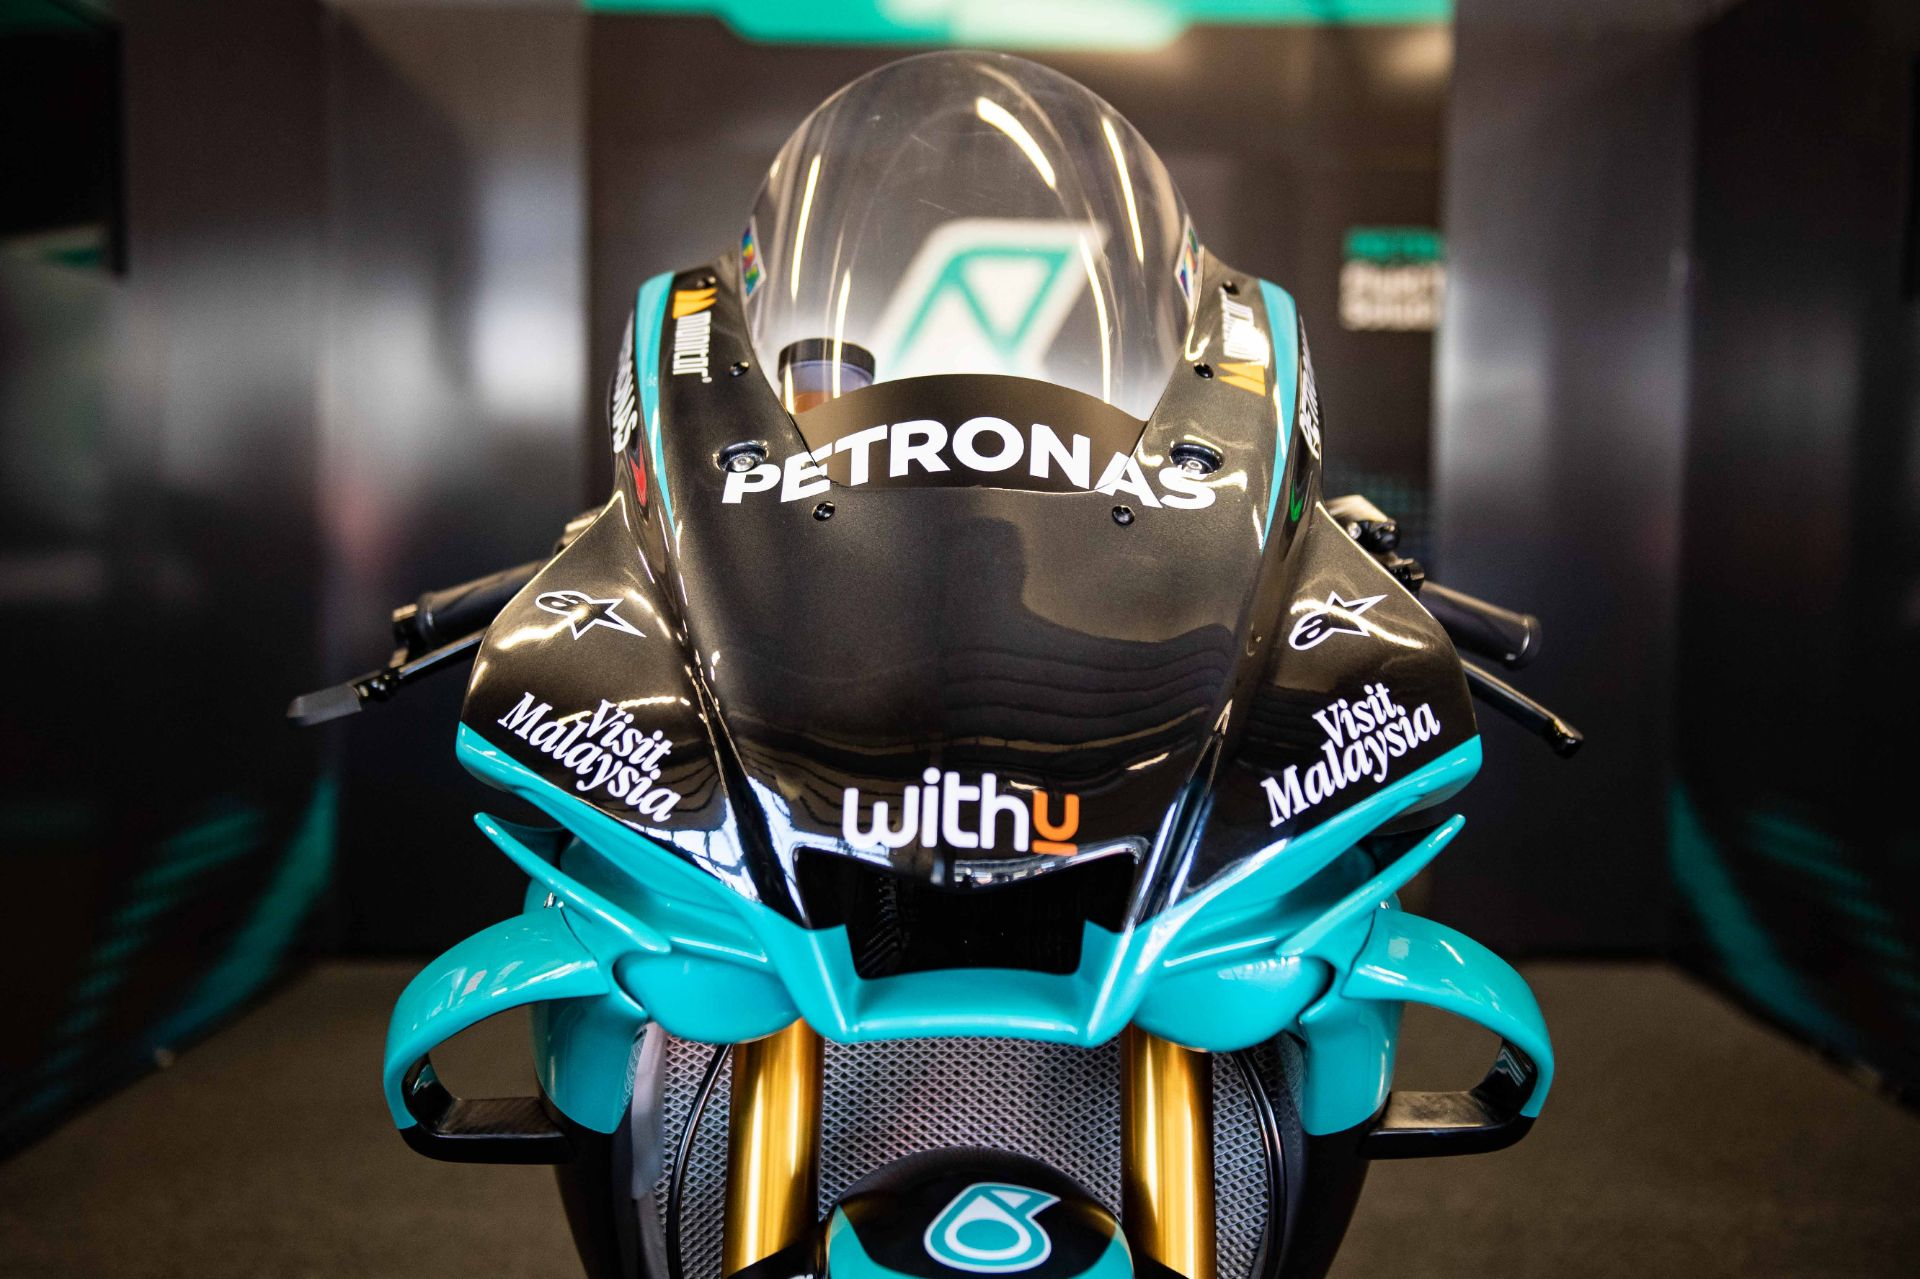 Yme And Yart Gytr Pro Shop Unveil Official Petronas Yamaha Sepang Racing Team Replica R1